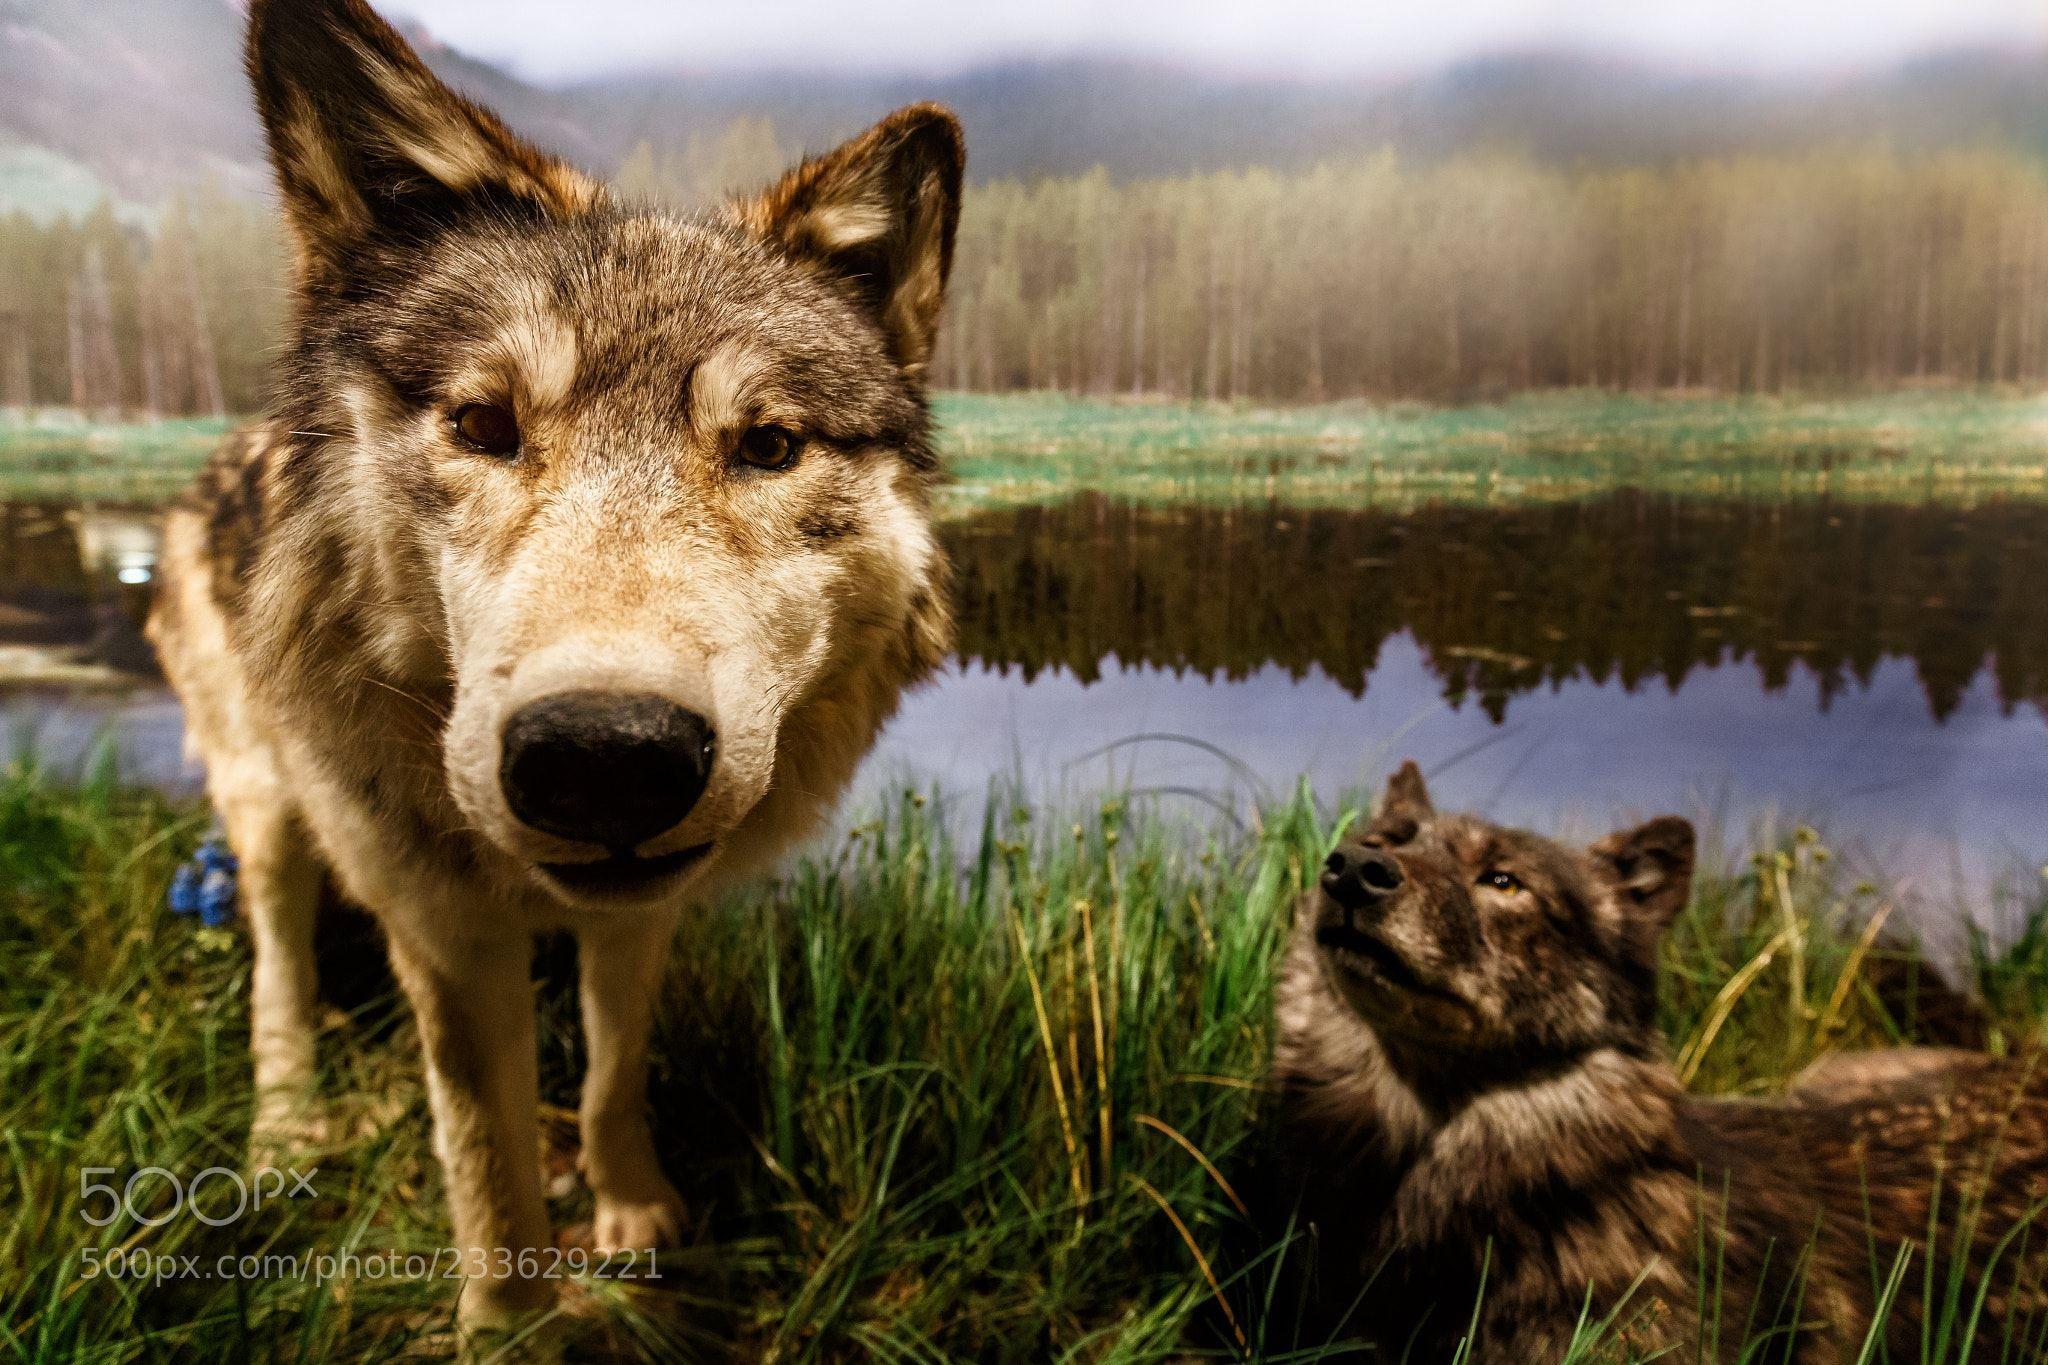 Badezimmer Reuter ~ The wolf thomas reuter gera deutschland #canon eos 6d